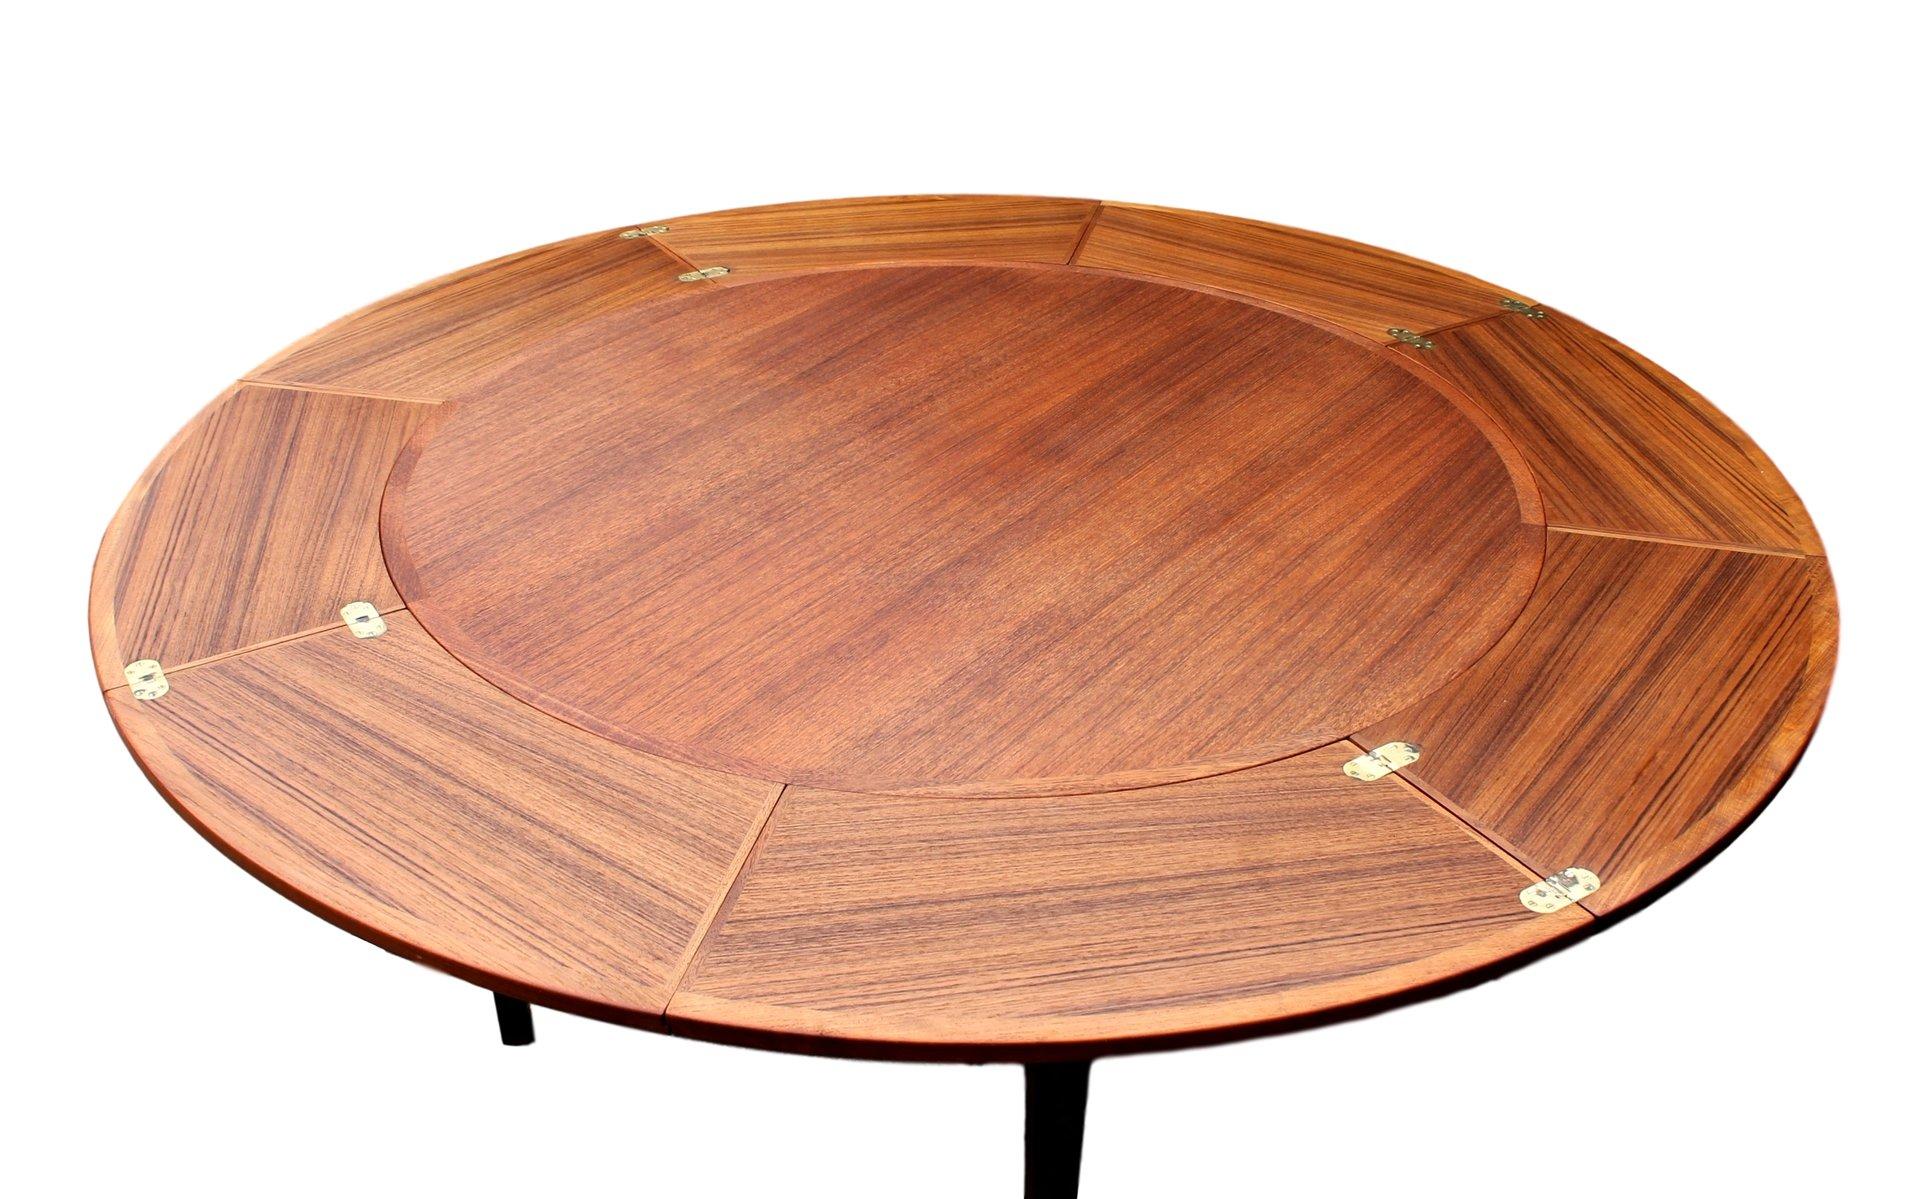 Vintage Flip Flap Lotus Teak Dining Table from Dyrlund for  : vintage flip flap lotus teak dining table from dyrlund 3 from www.pamono.com size 1920 x 1198 jpeg 212kB